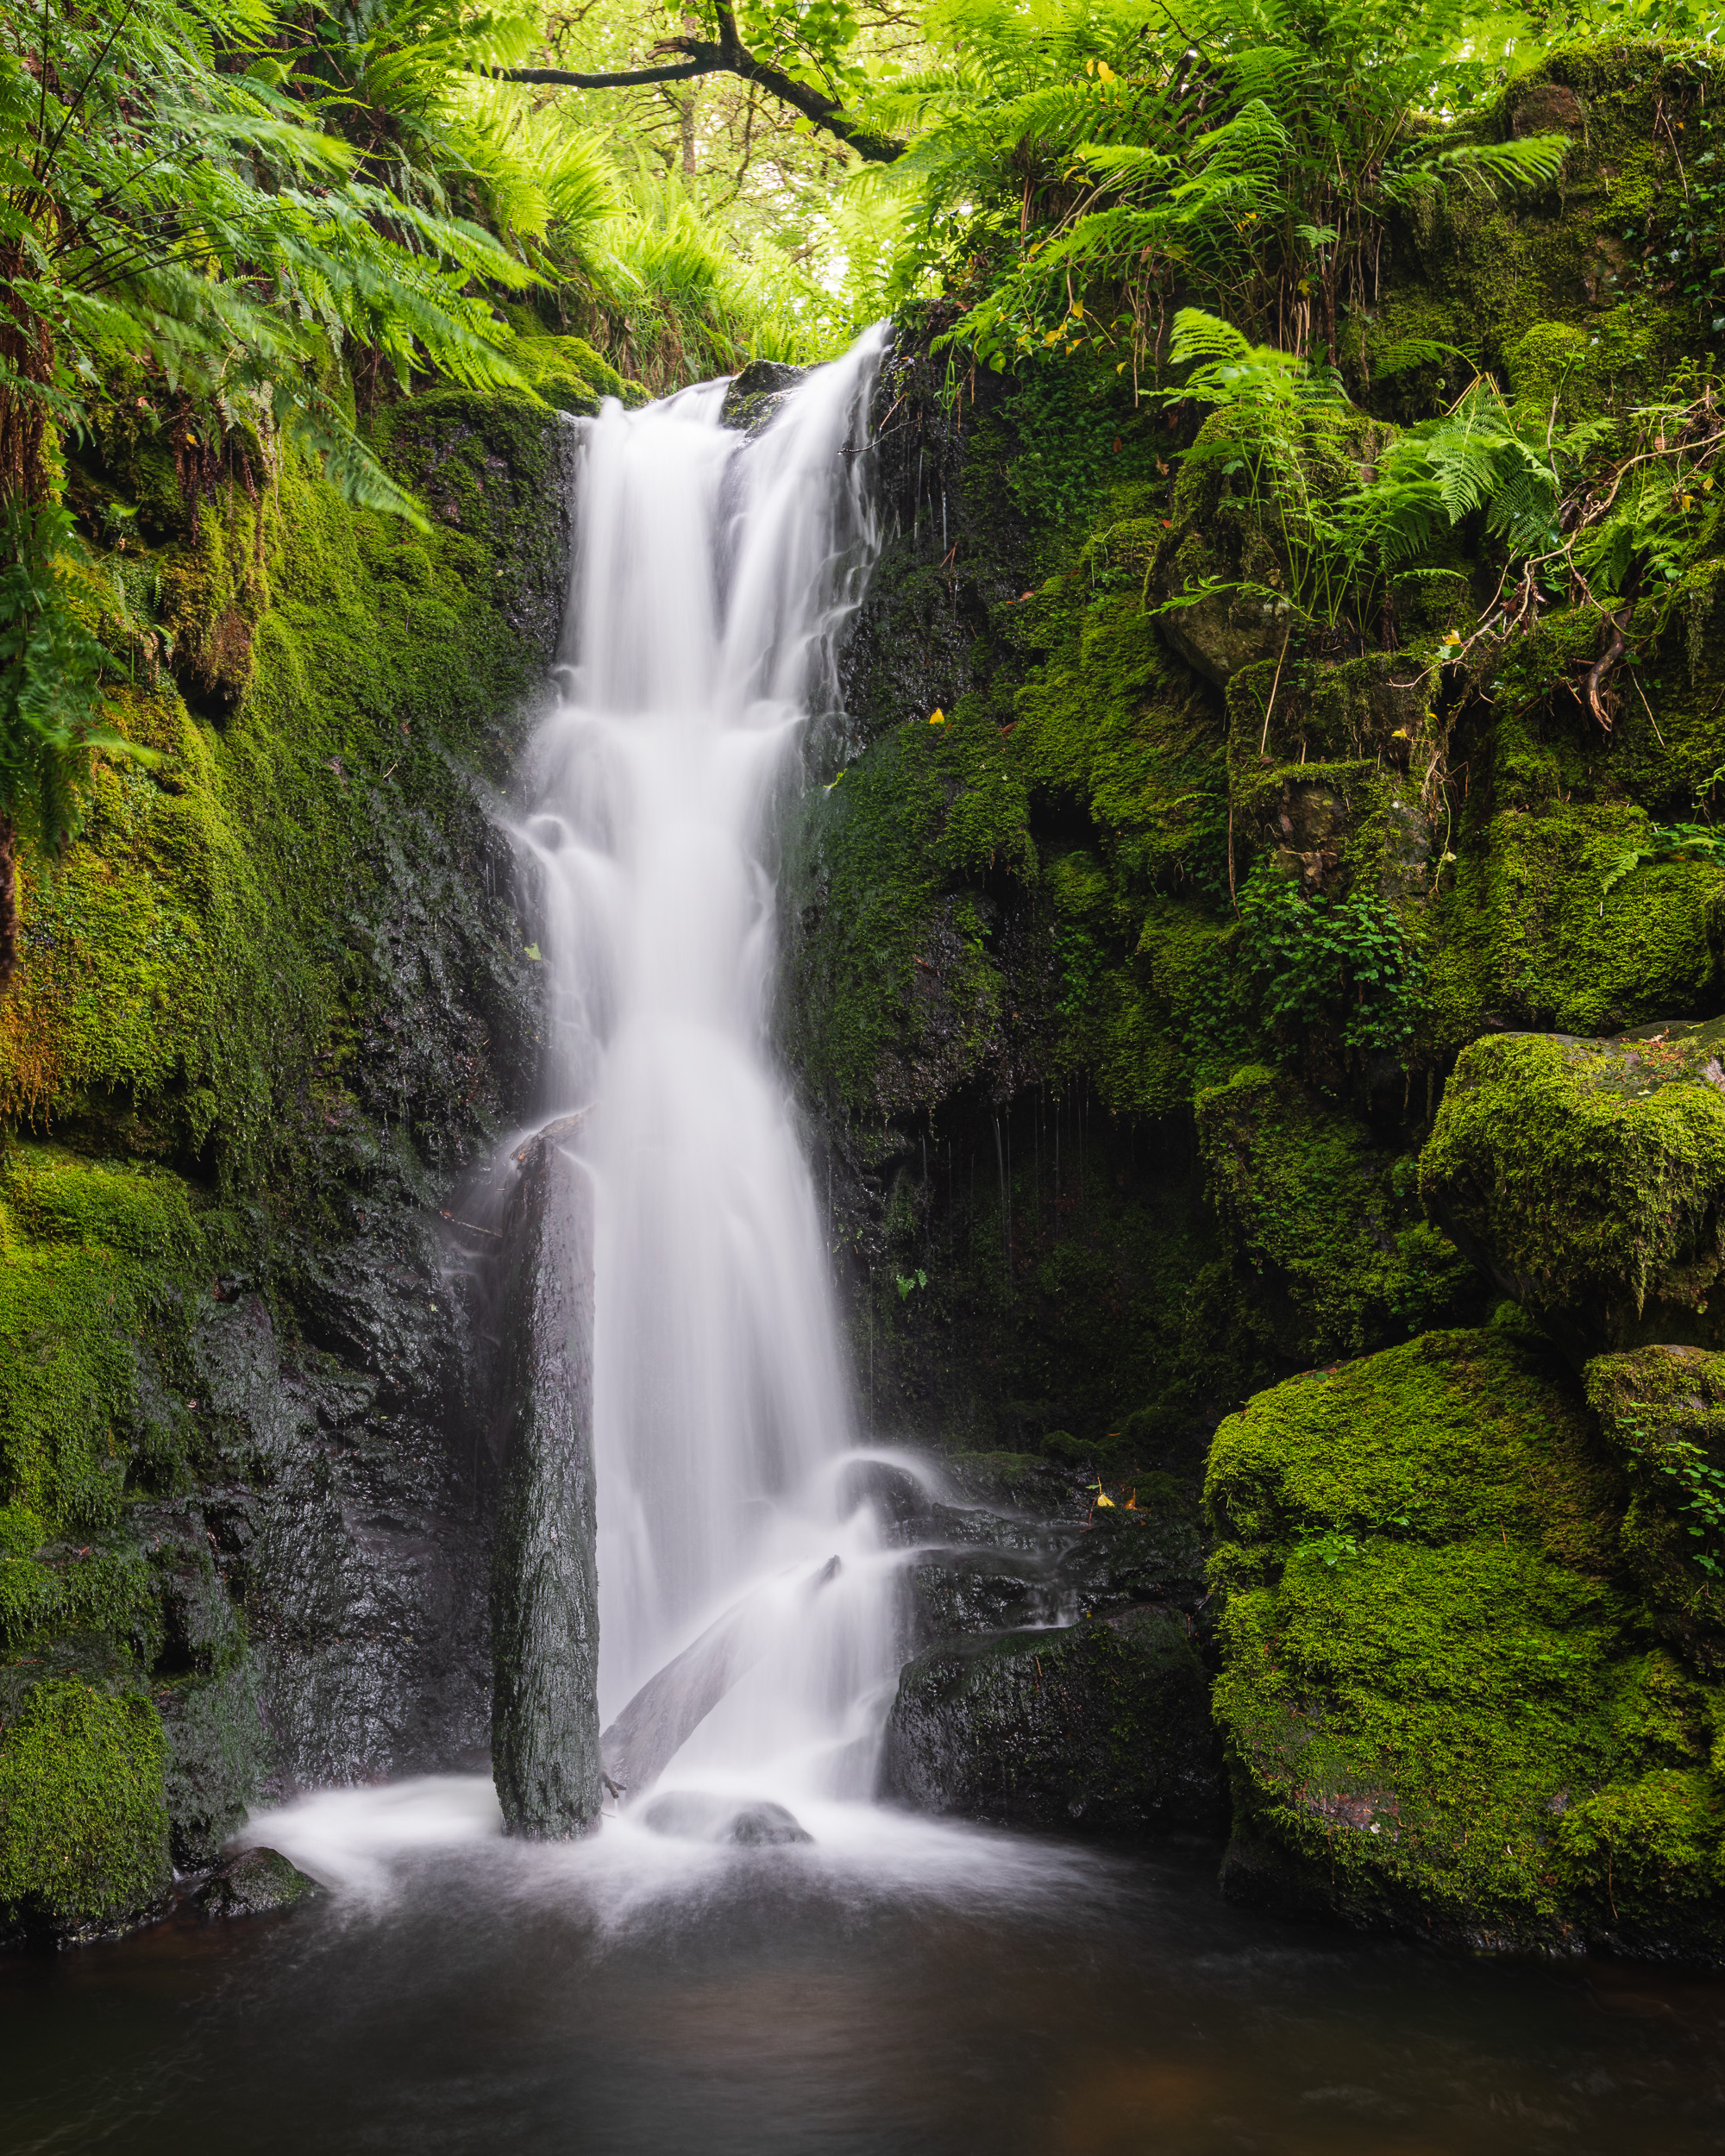 The Fall, Dartmoor, Devon  - Nikon D850, Nikkor 16-35 mm f/4 at 35 mm, f/11, 2.5 sec at ISO 64, Kase CPL.